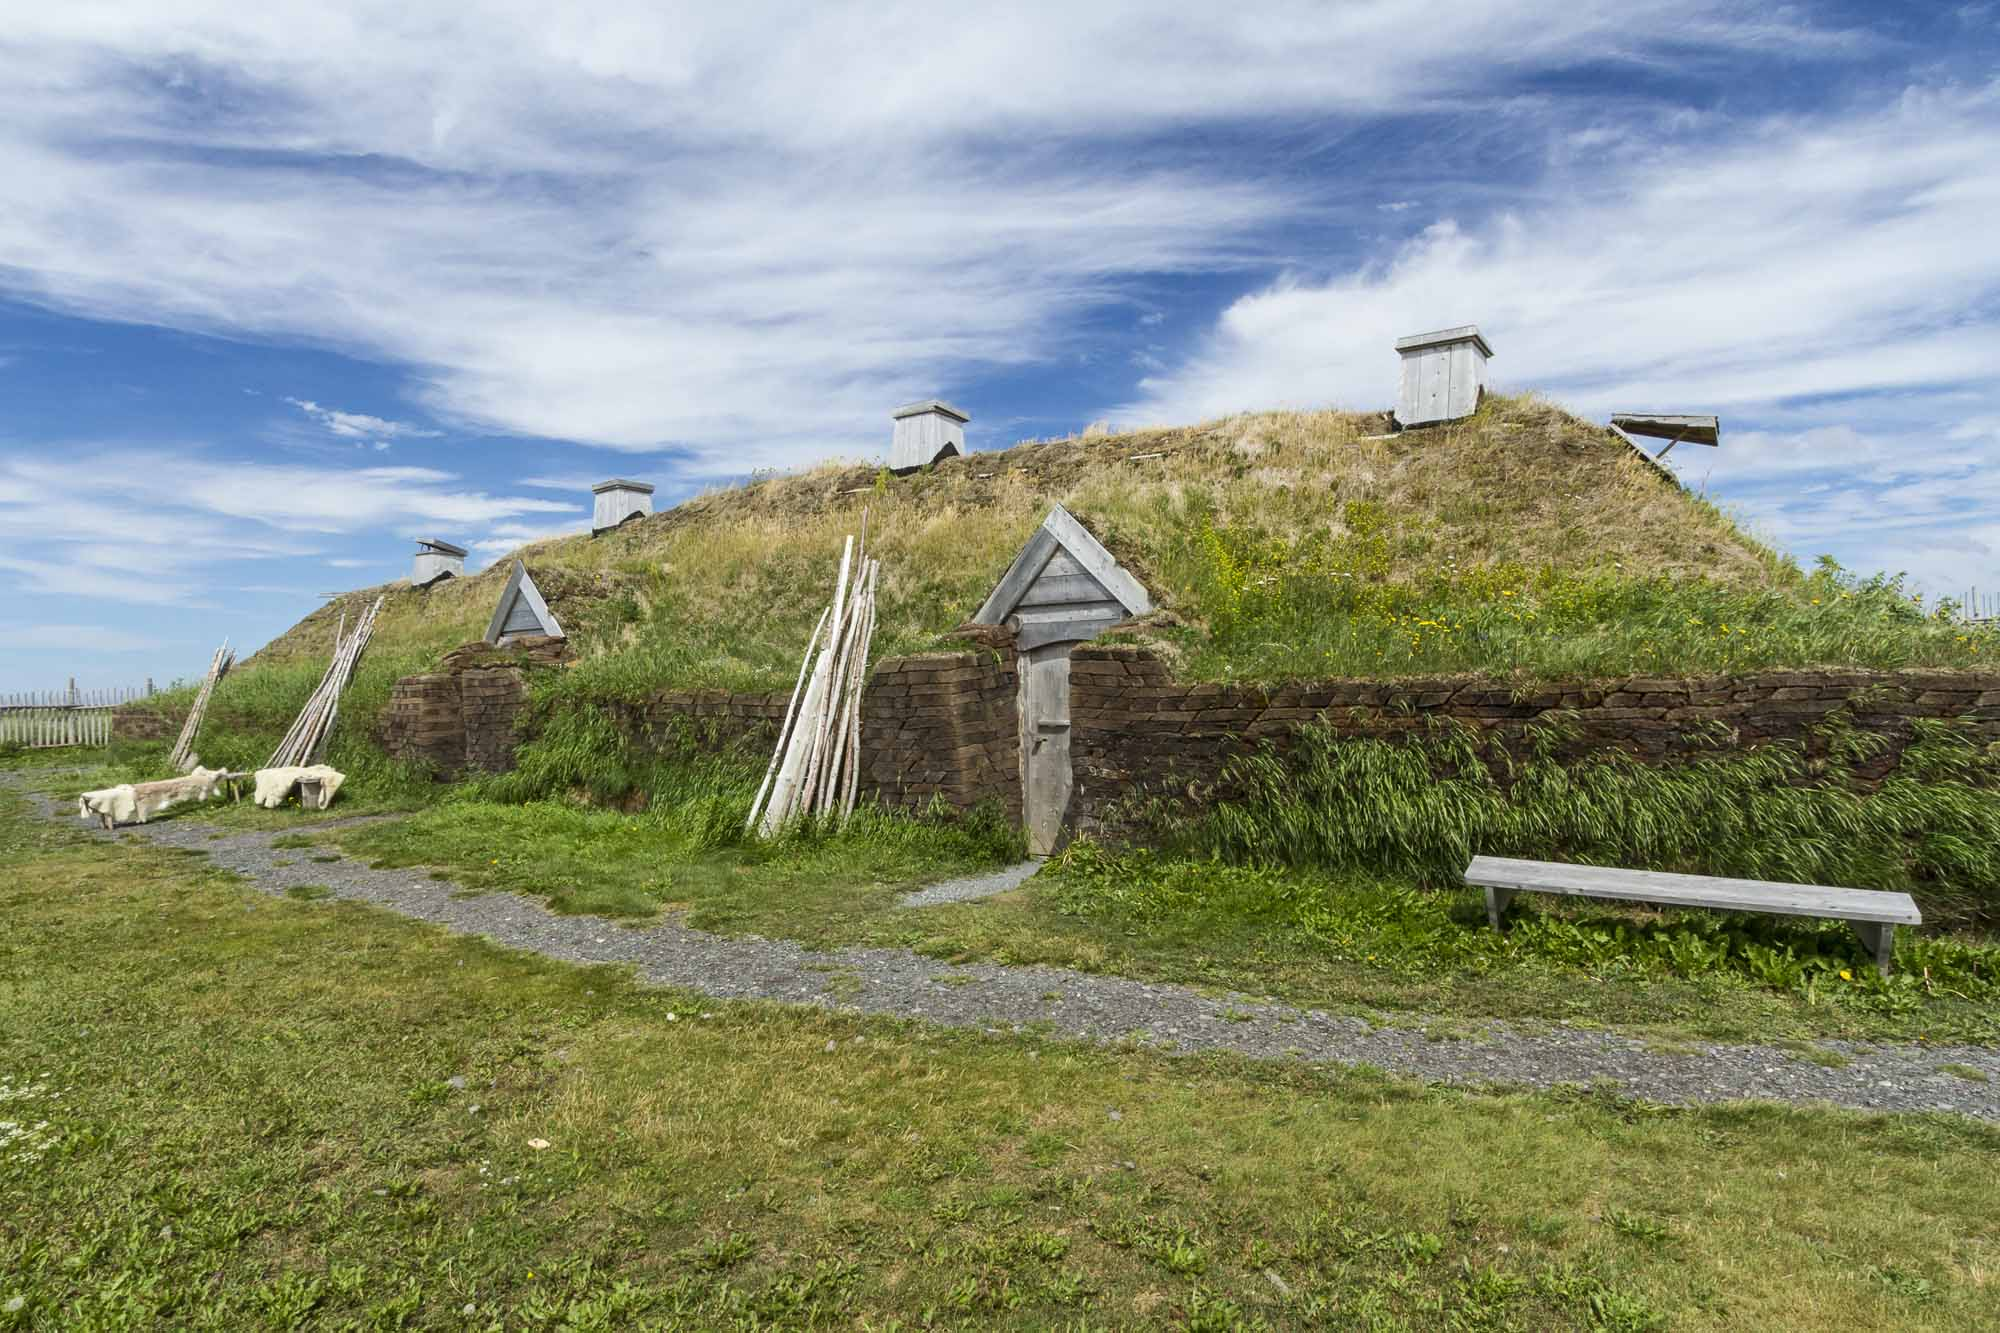 L'Anse Aux Meadows Viking Long Hall